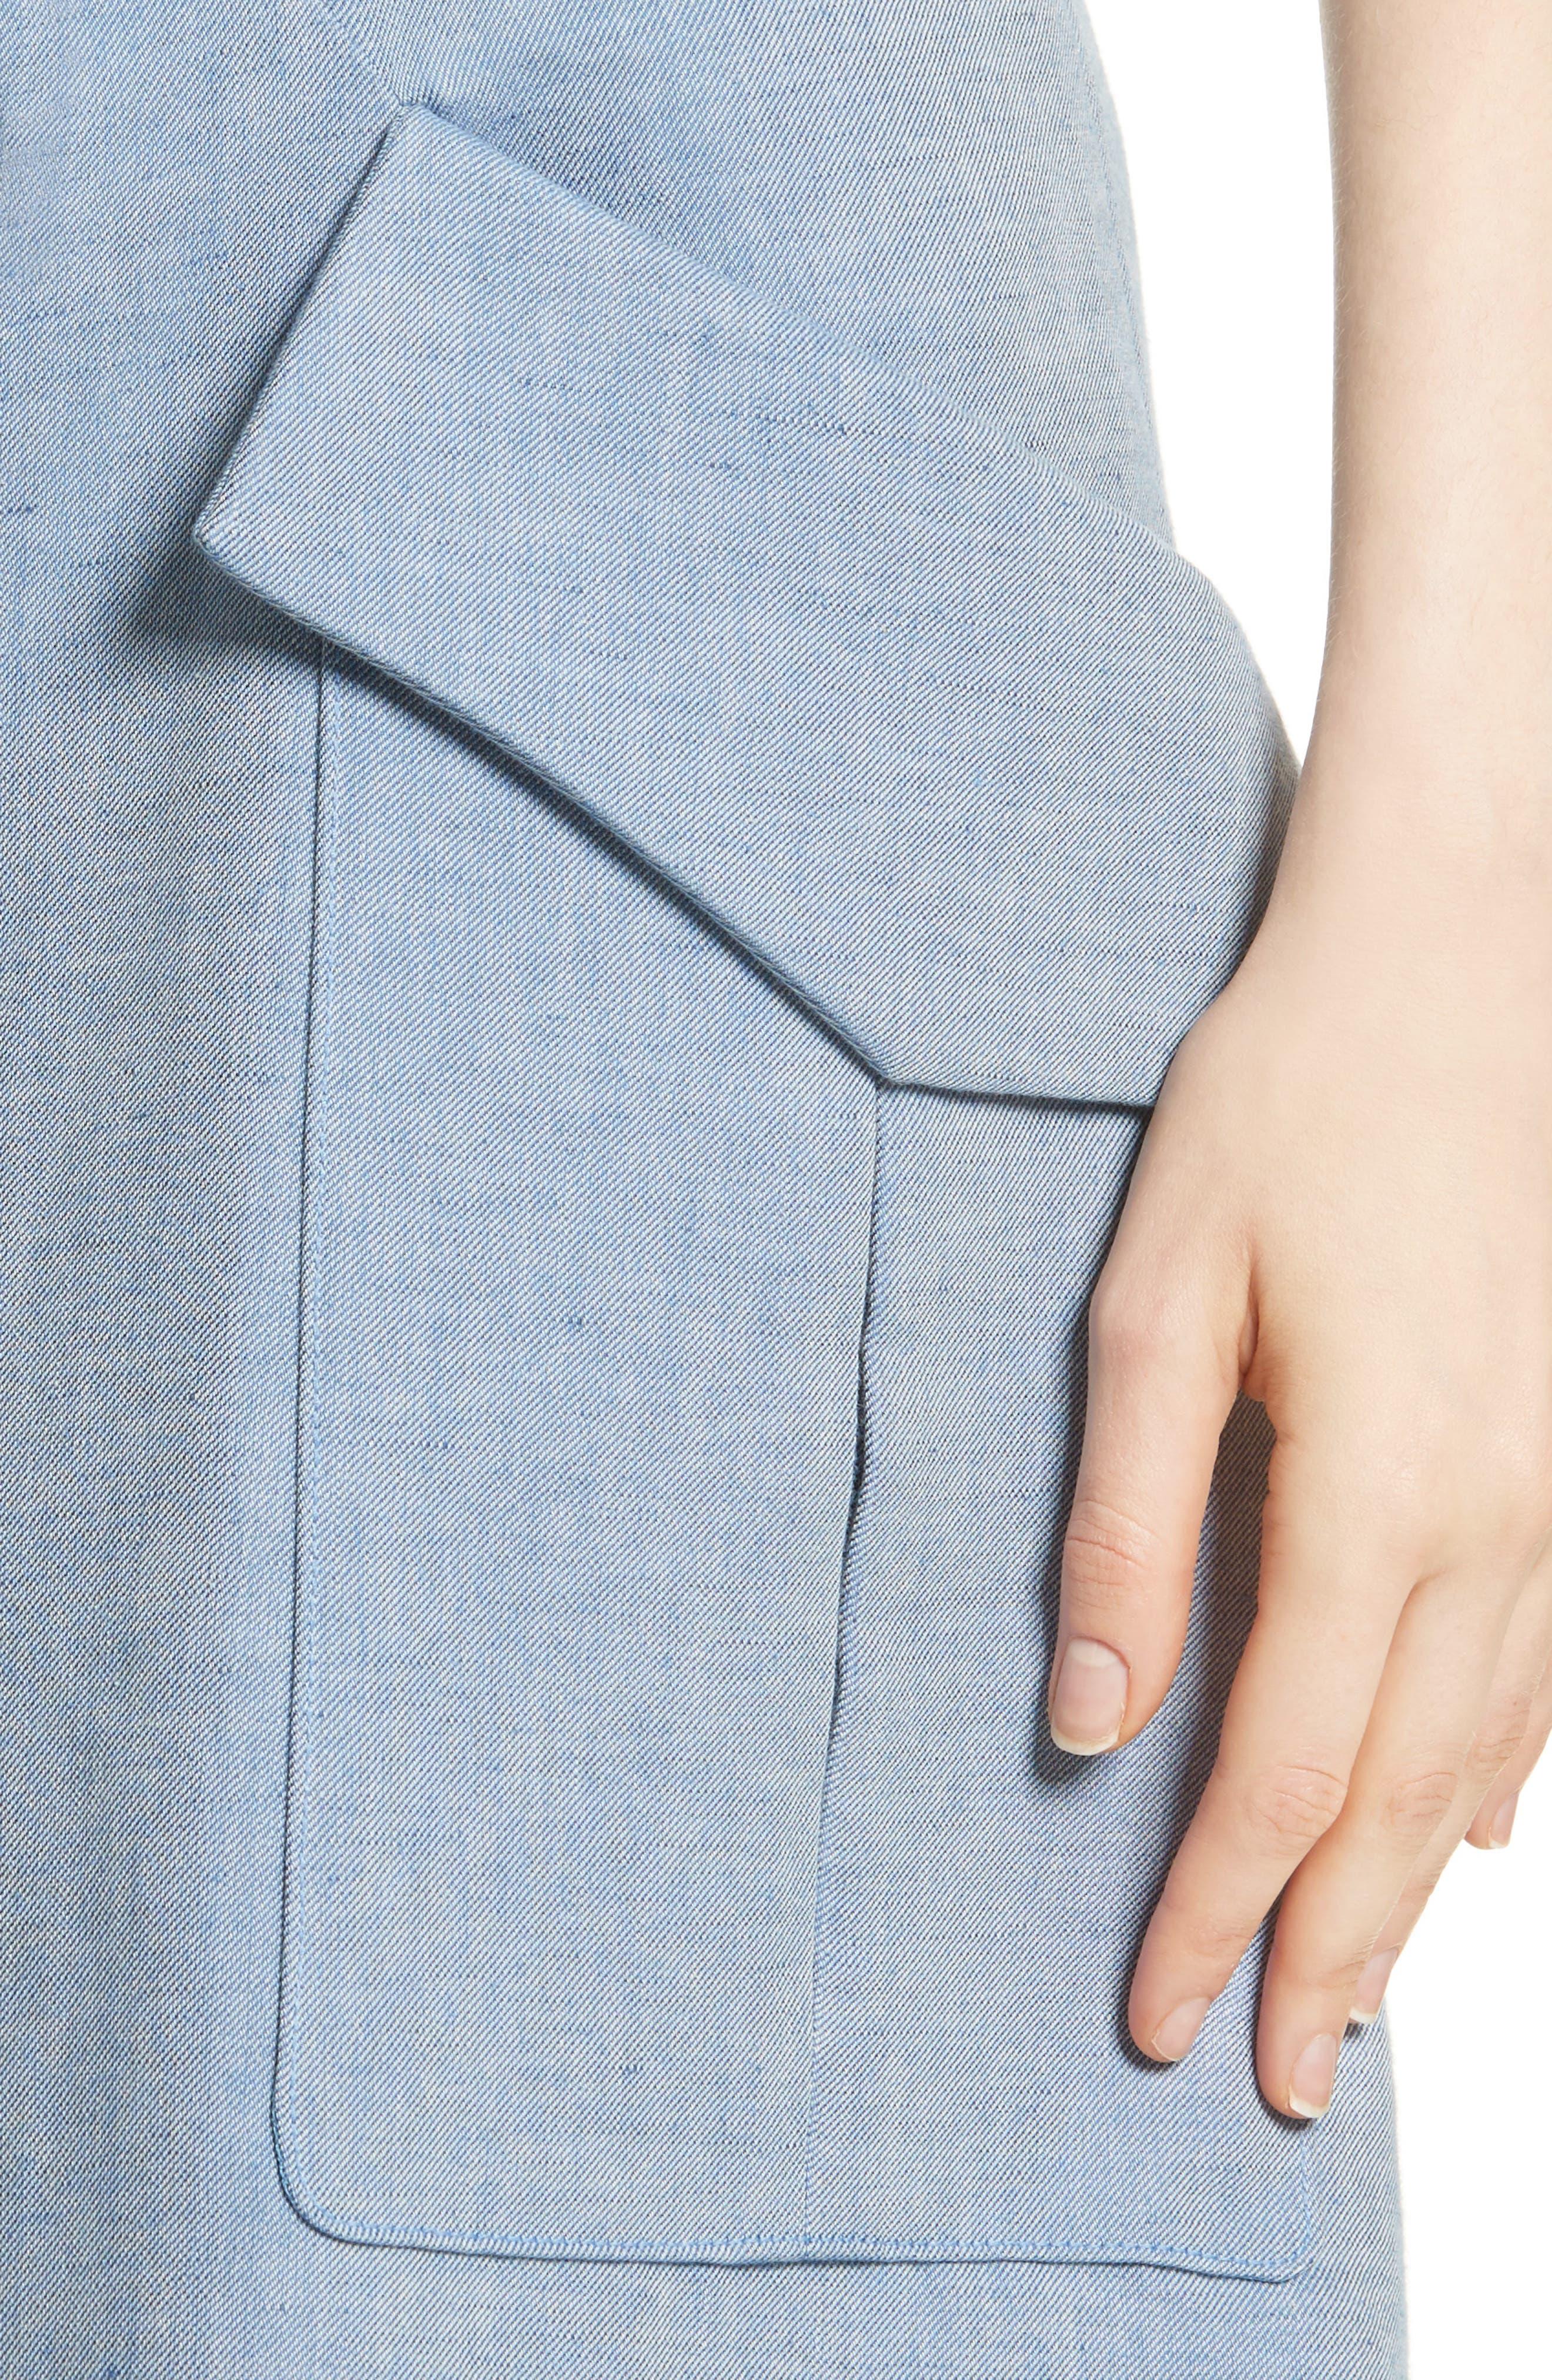 Jupe Genou Skirt,                             Alternate thumbnail 4, color,                             Bleu Acier